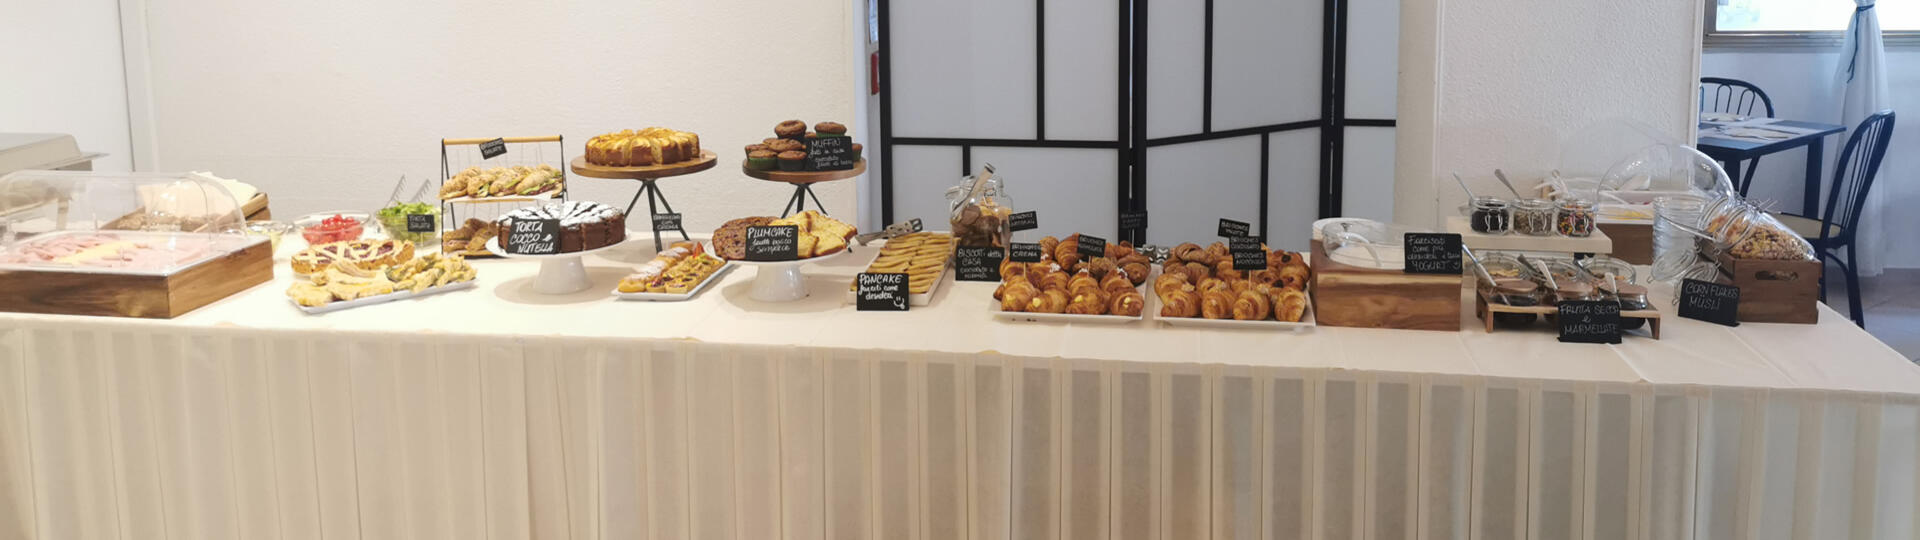 hotelbelliniriccione it breakfast 012